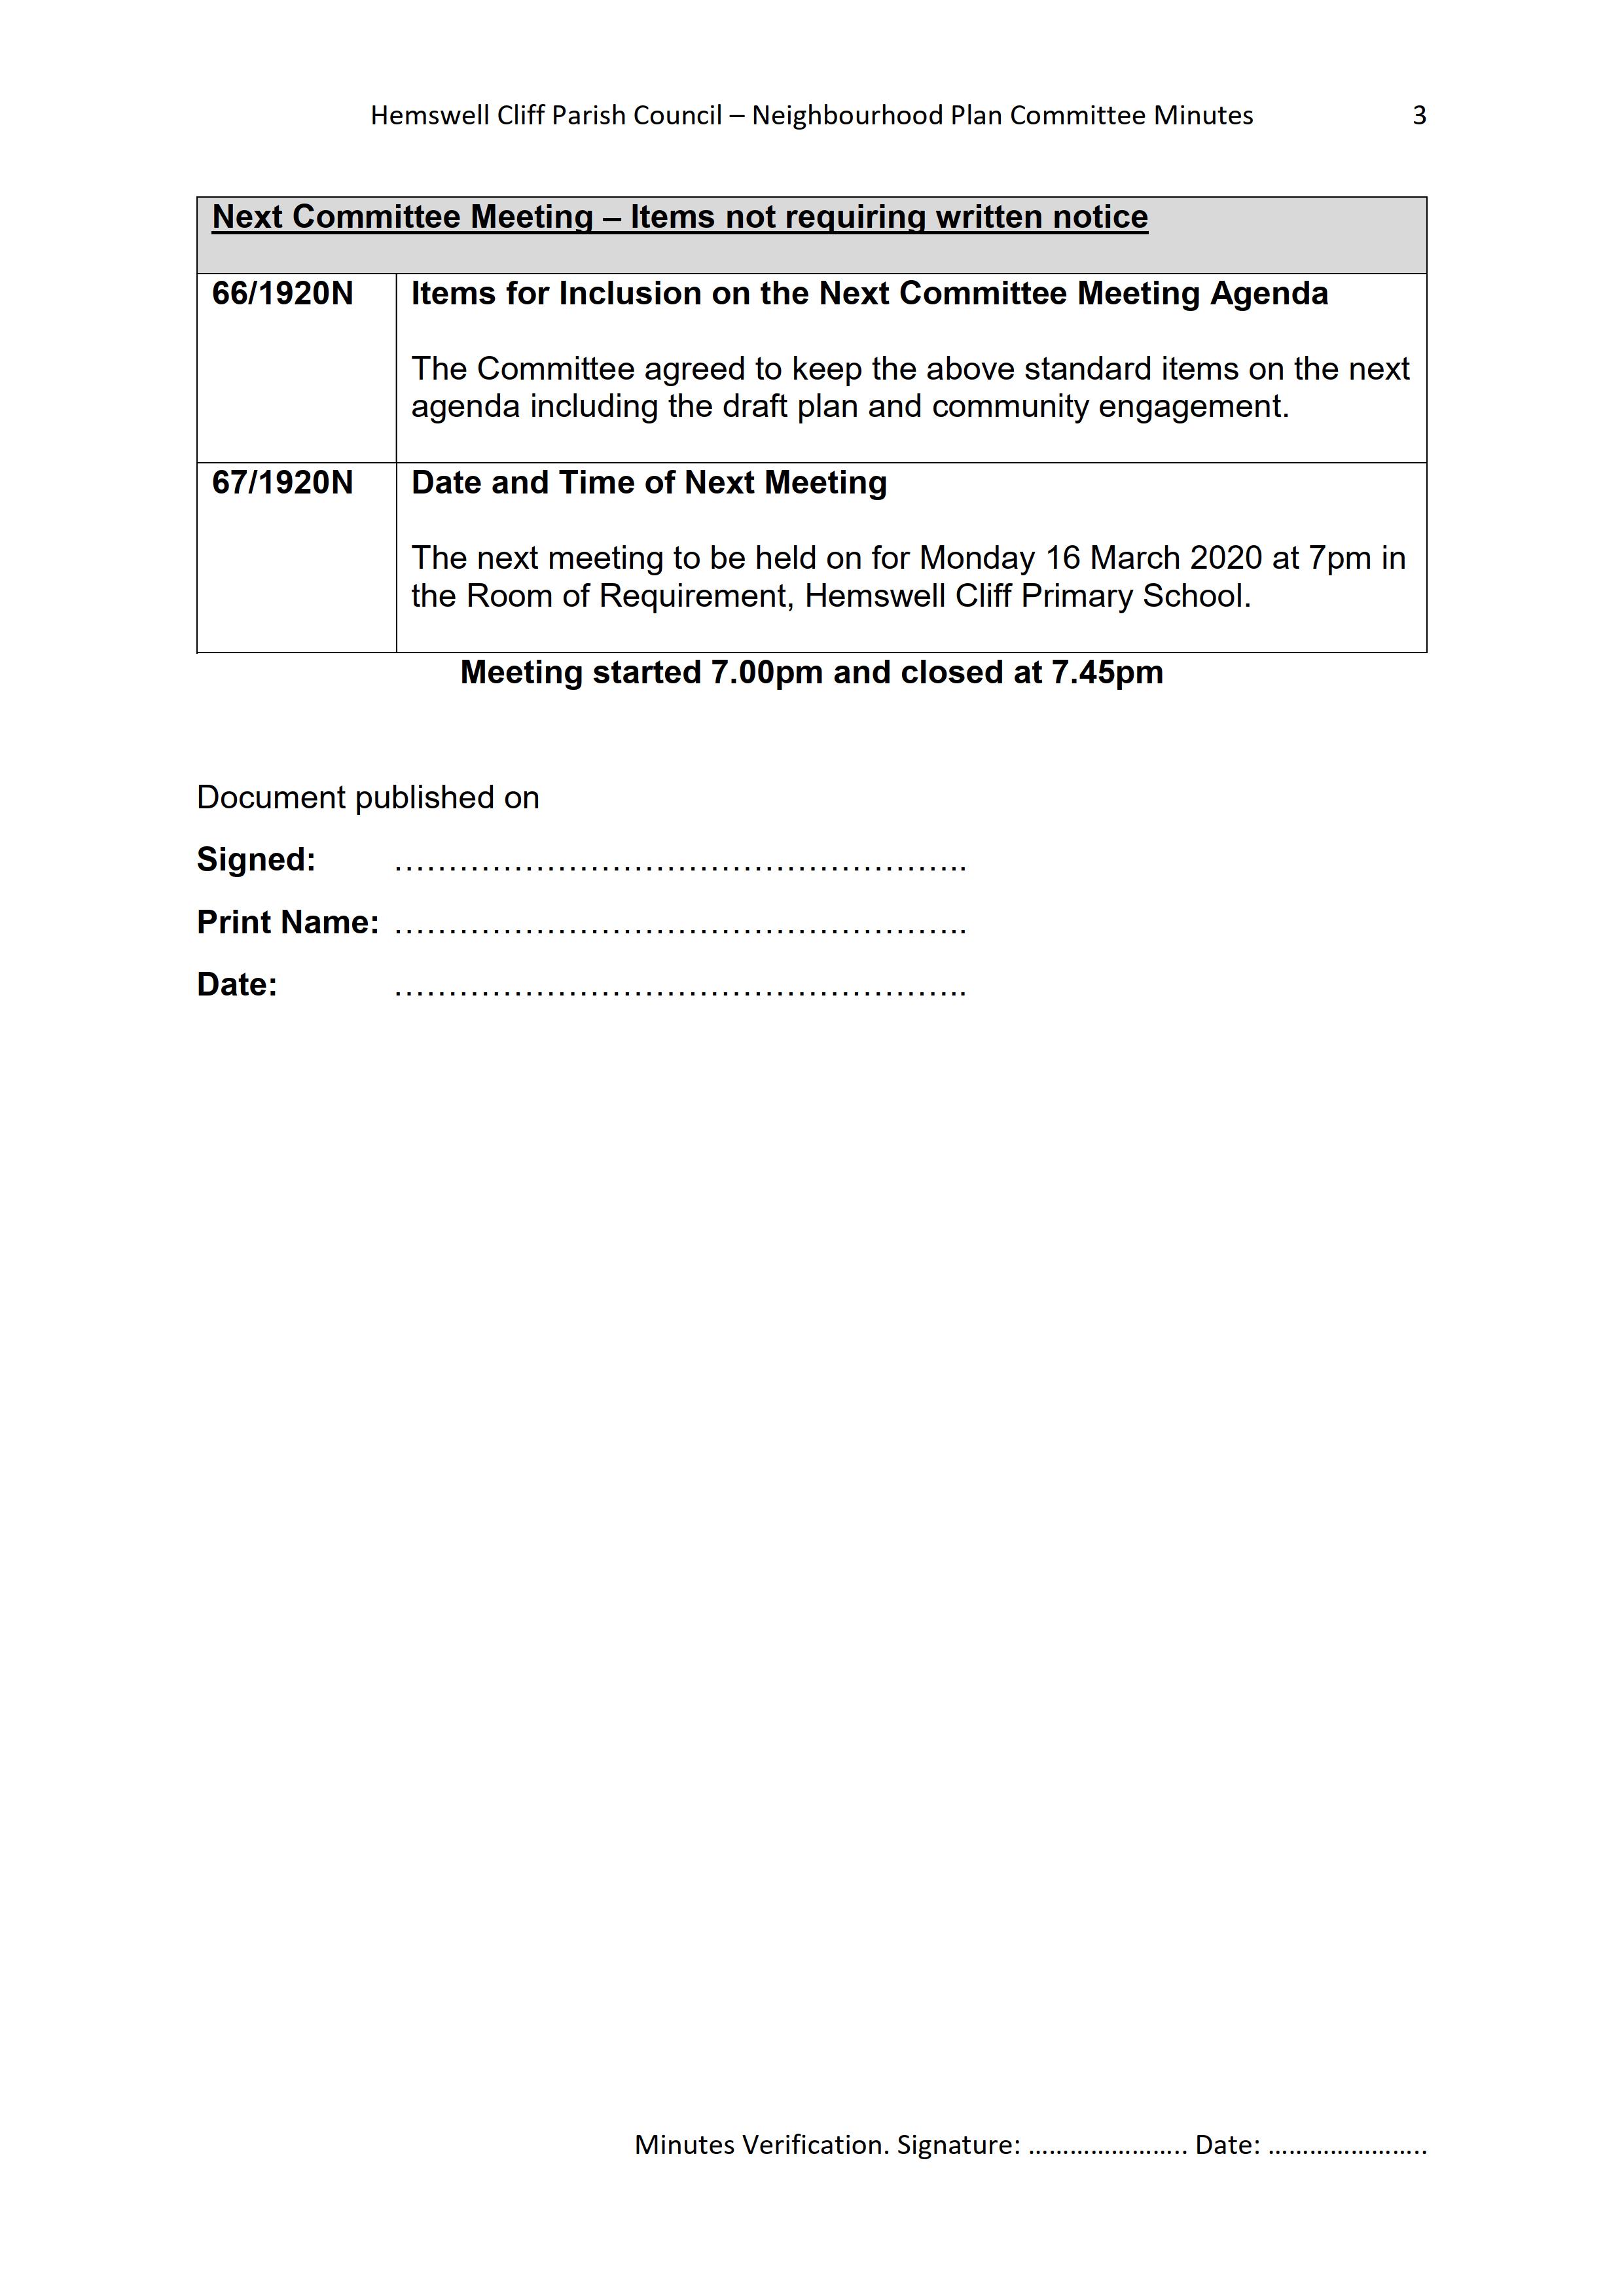 HCPC_NPC_Minutes_17.02.20_3.png